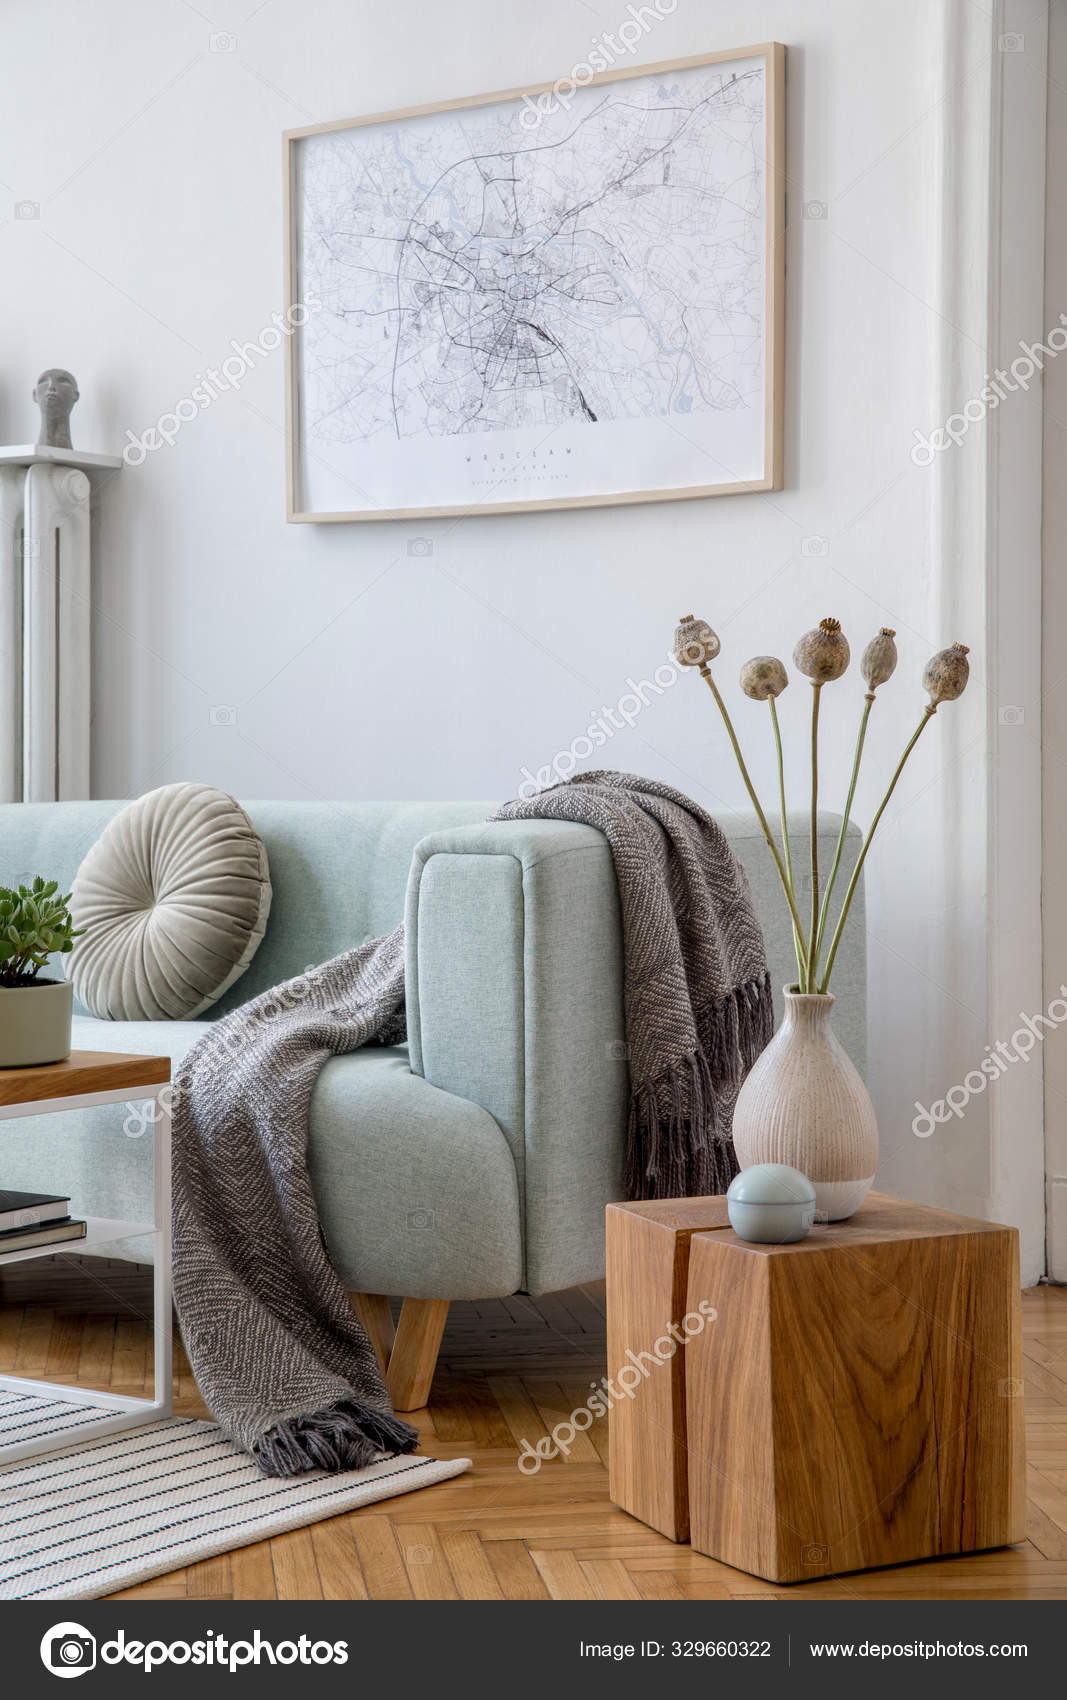 Modern Interior Design Sofa Contemporary Accessories Stylish Living Room Design Stock Photo Image By C Followtheflow 329660322